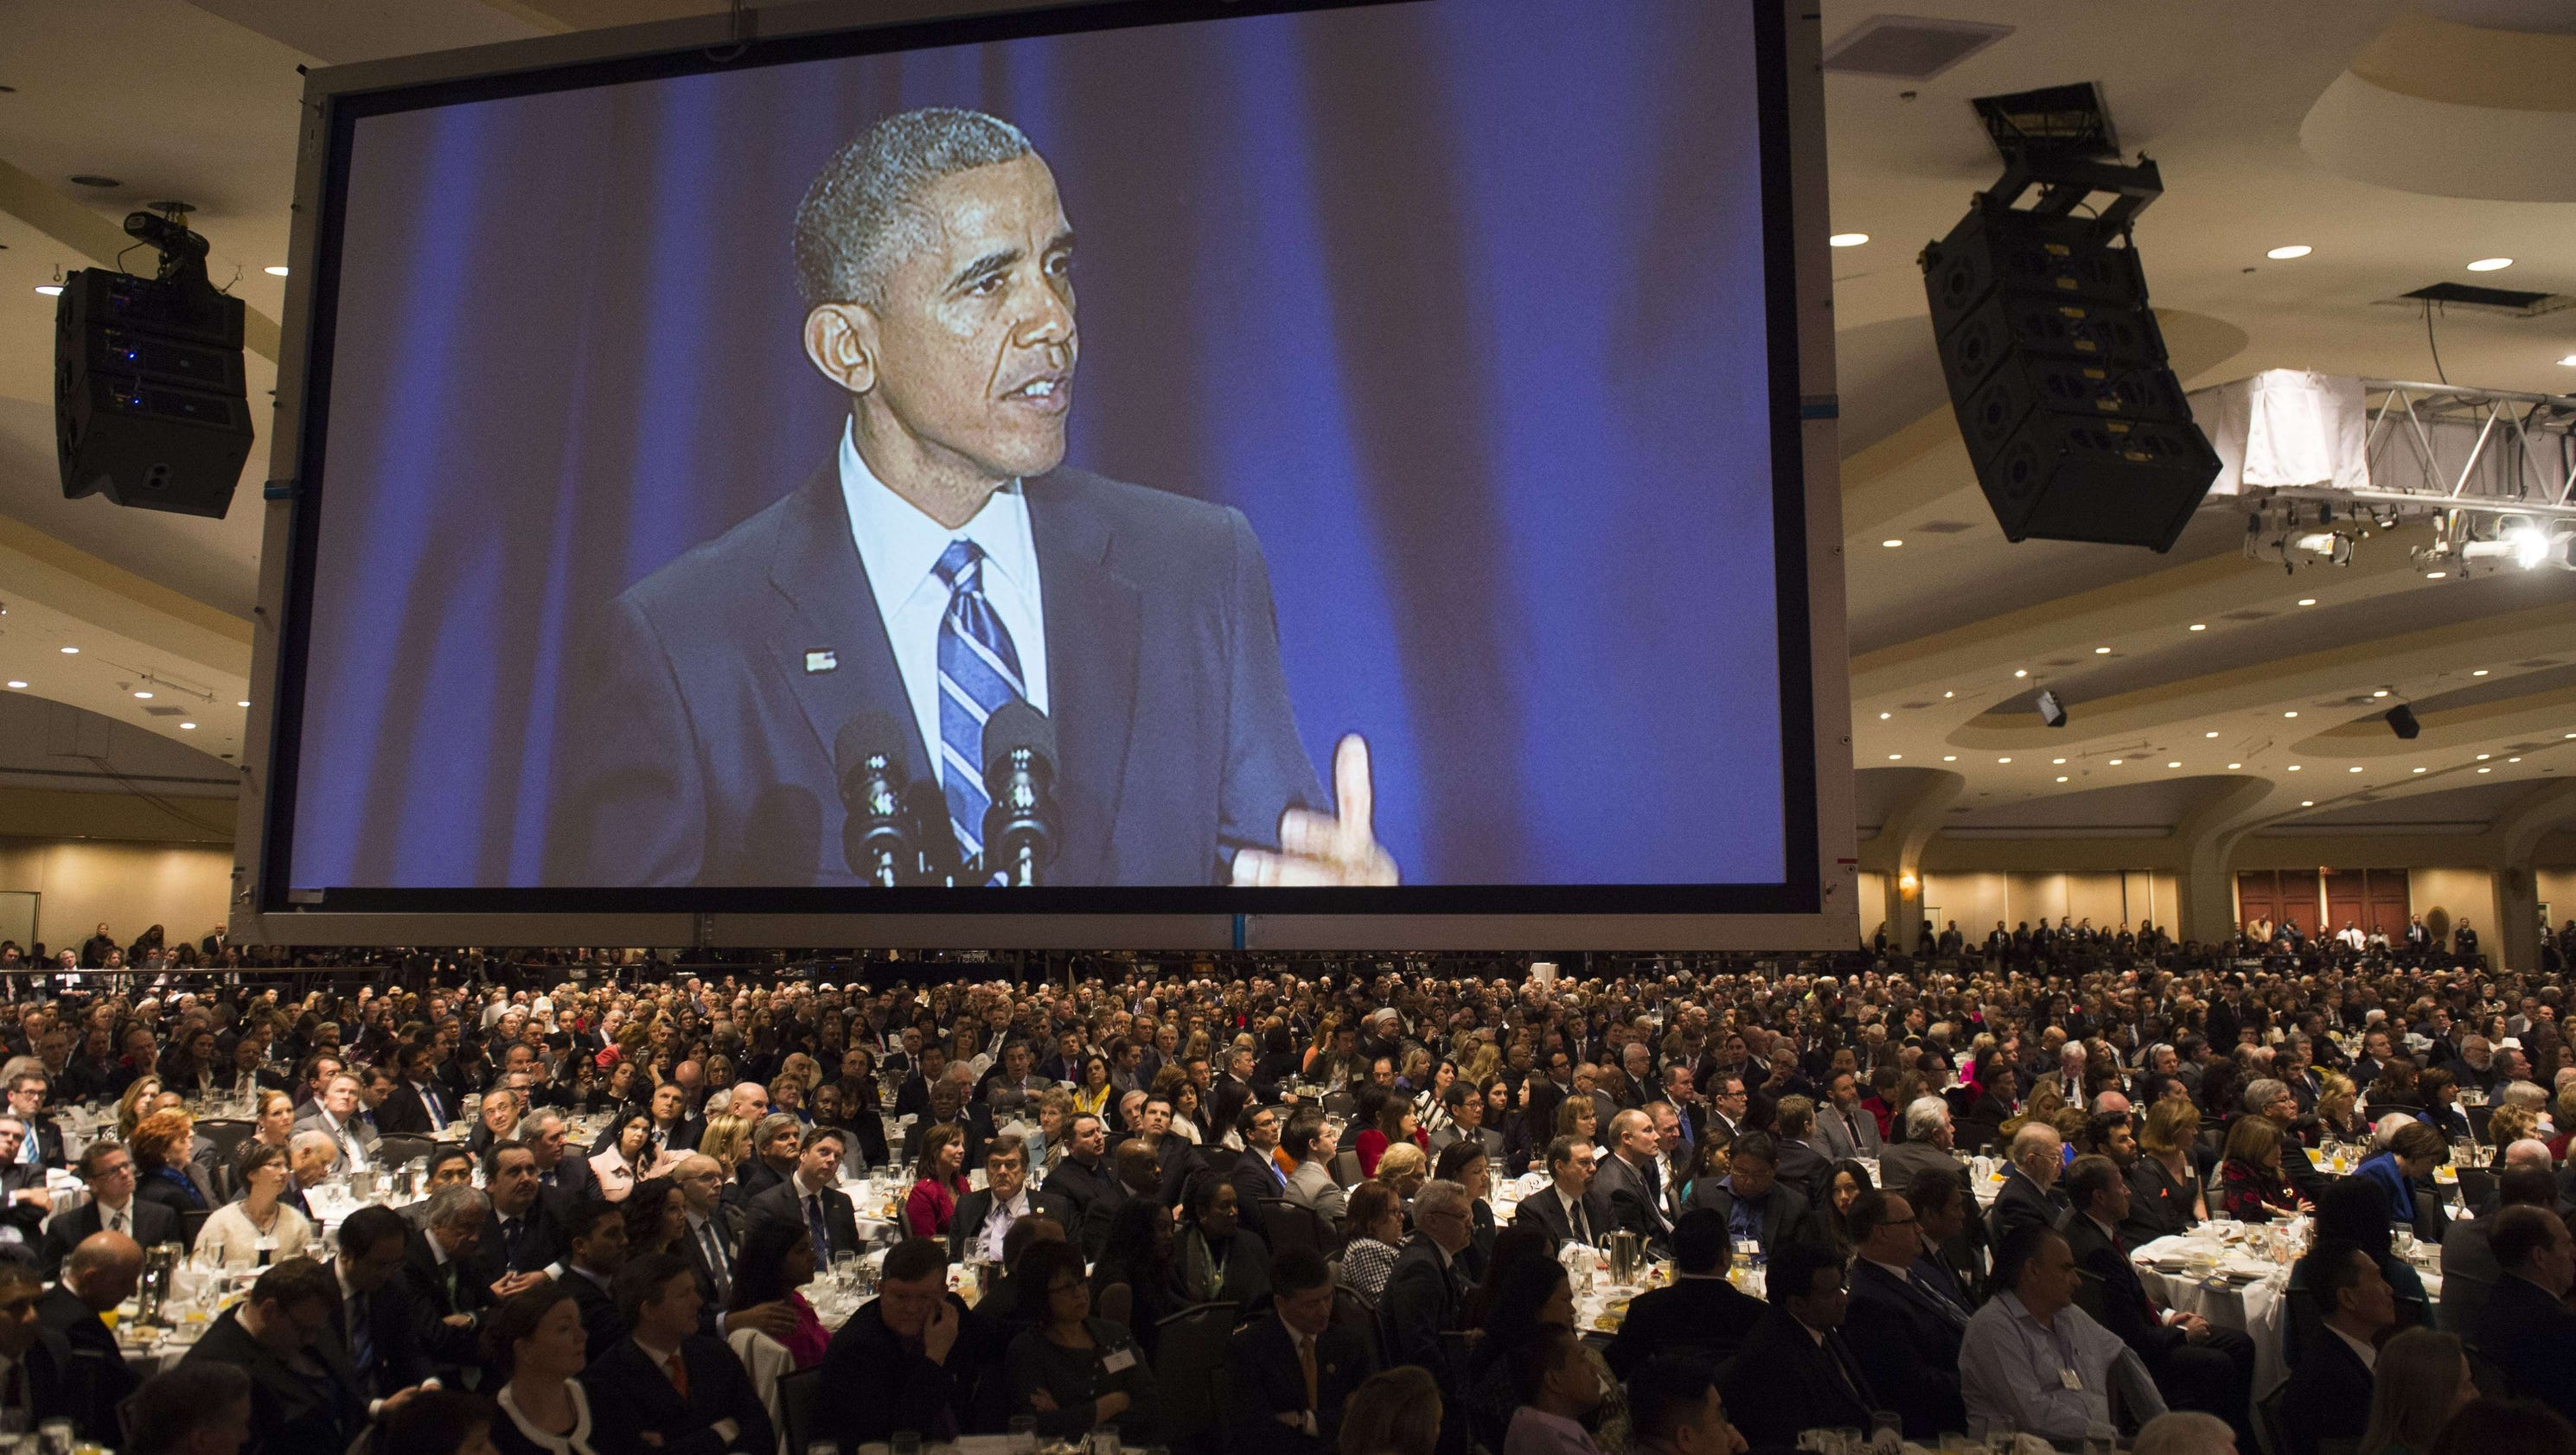 Obama's anti-American crusade comments: Column